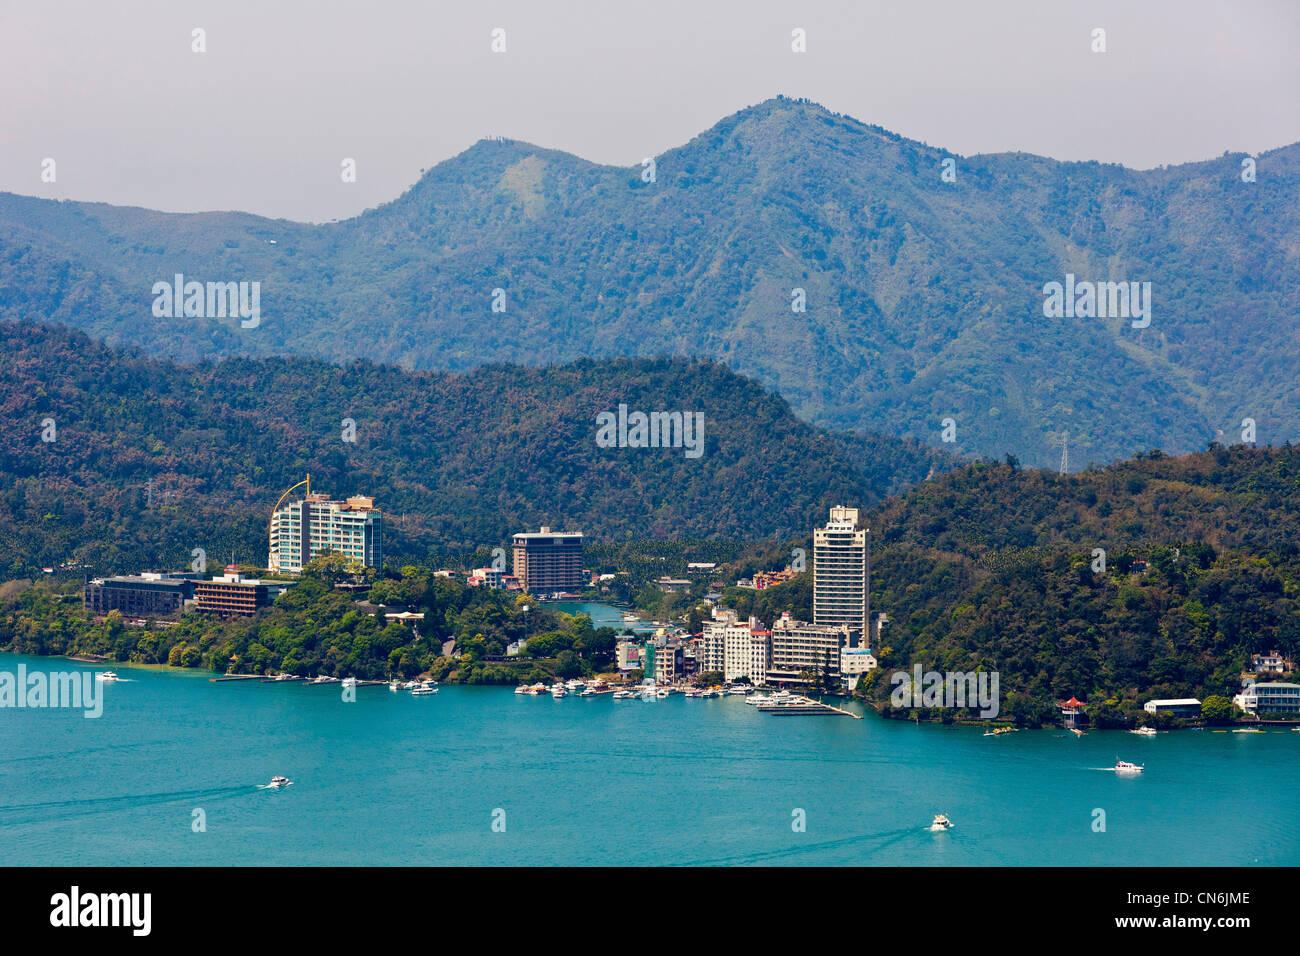 Sun Moon Lake, Taiwan. JMH5812 - Stock Image